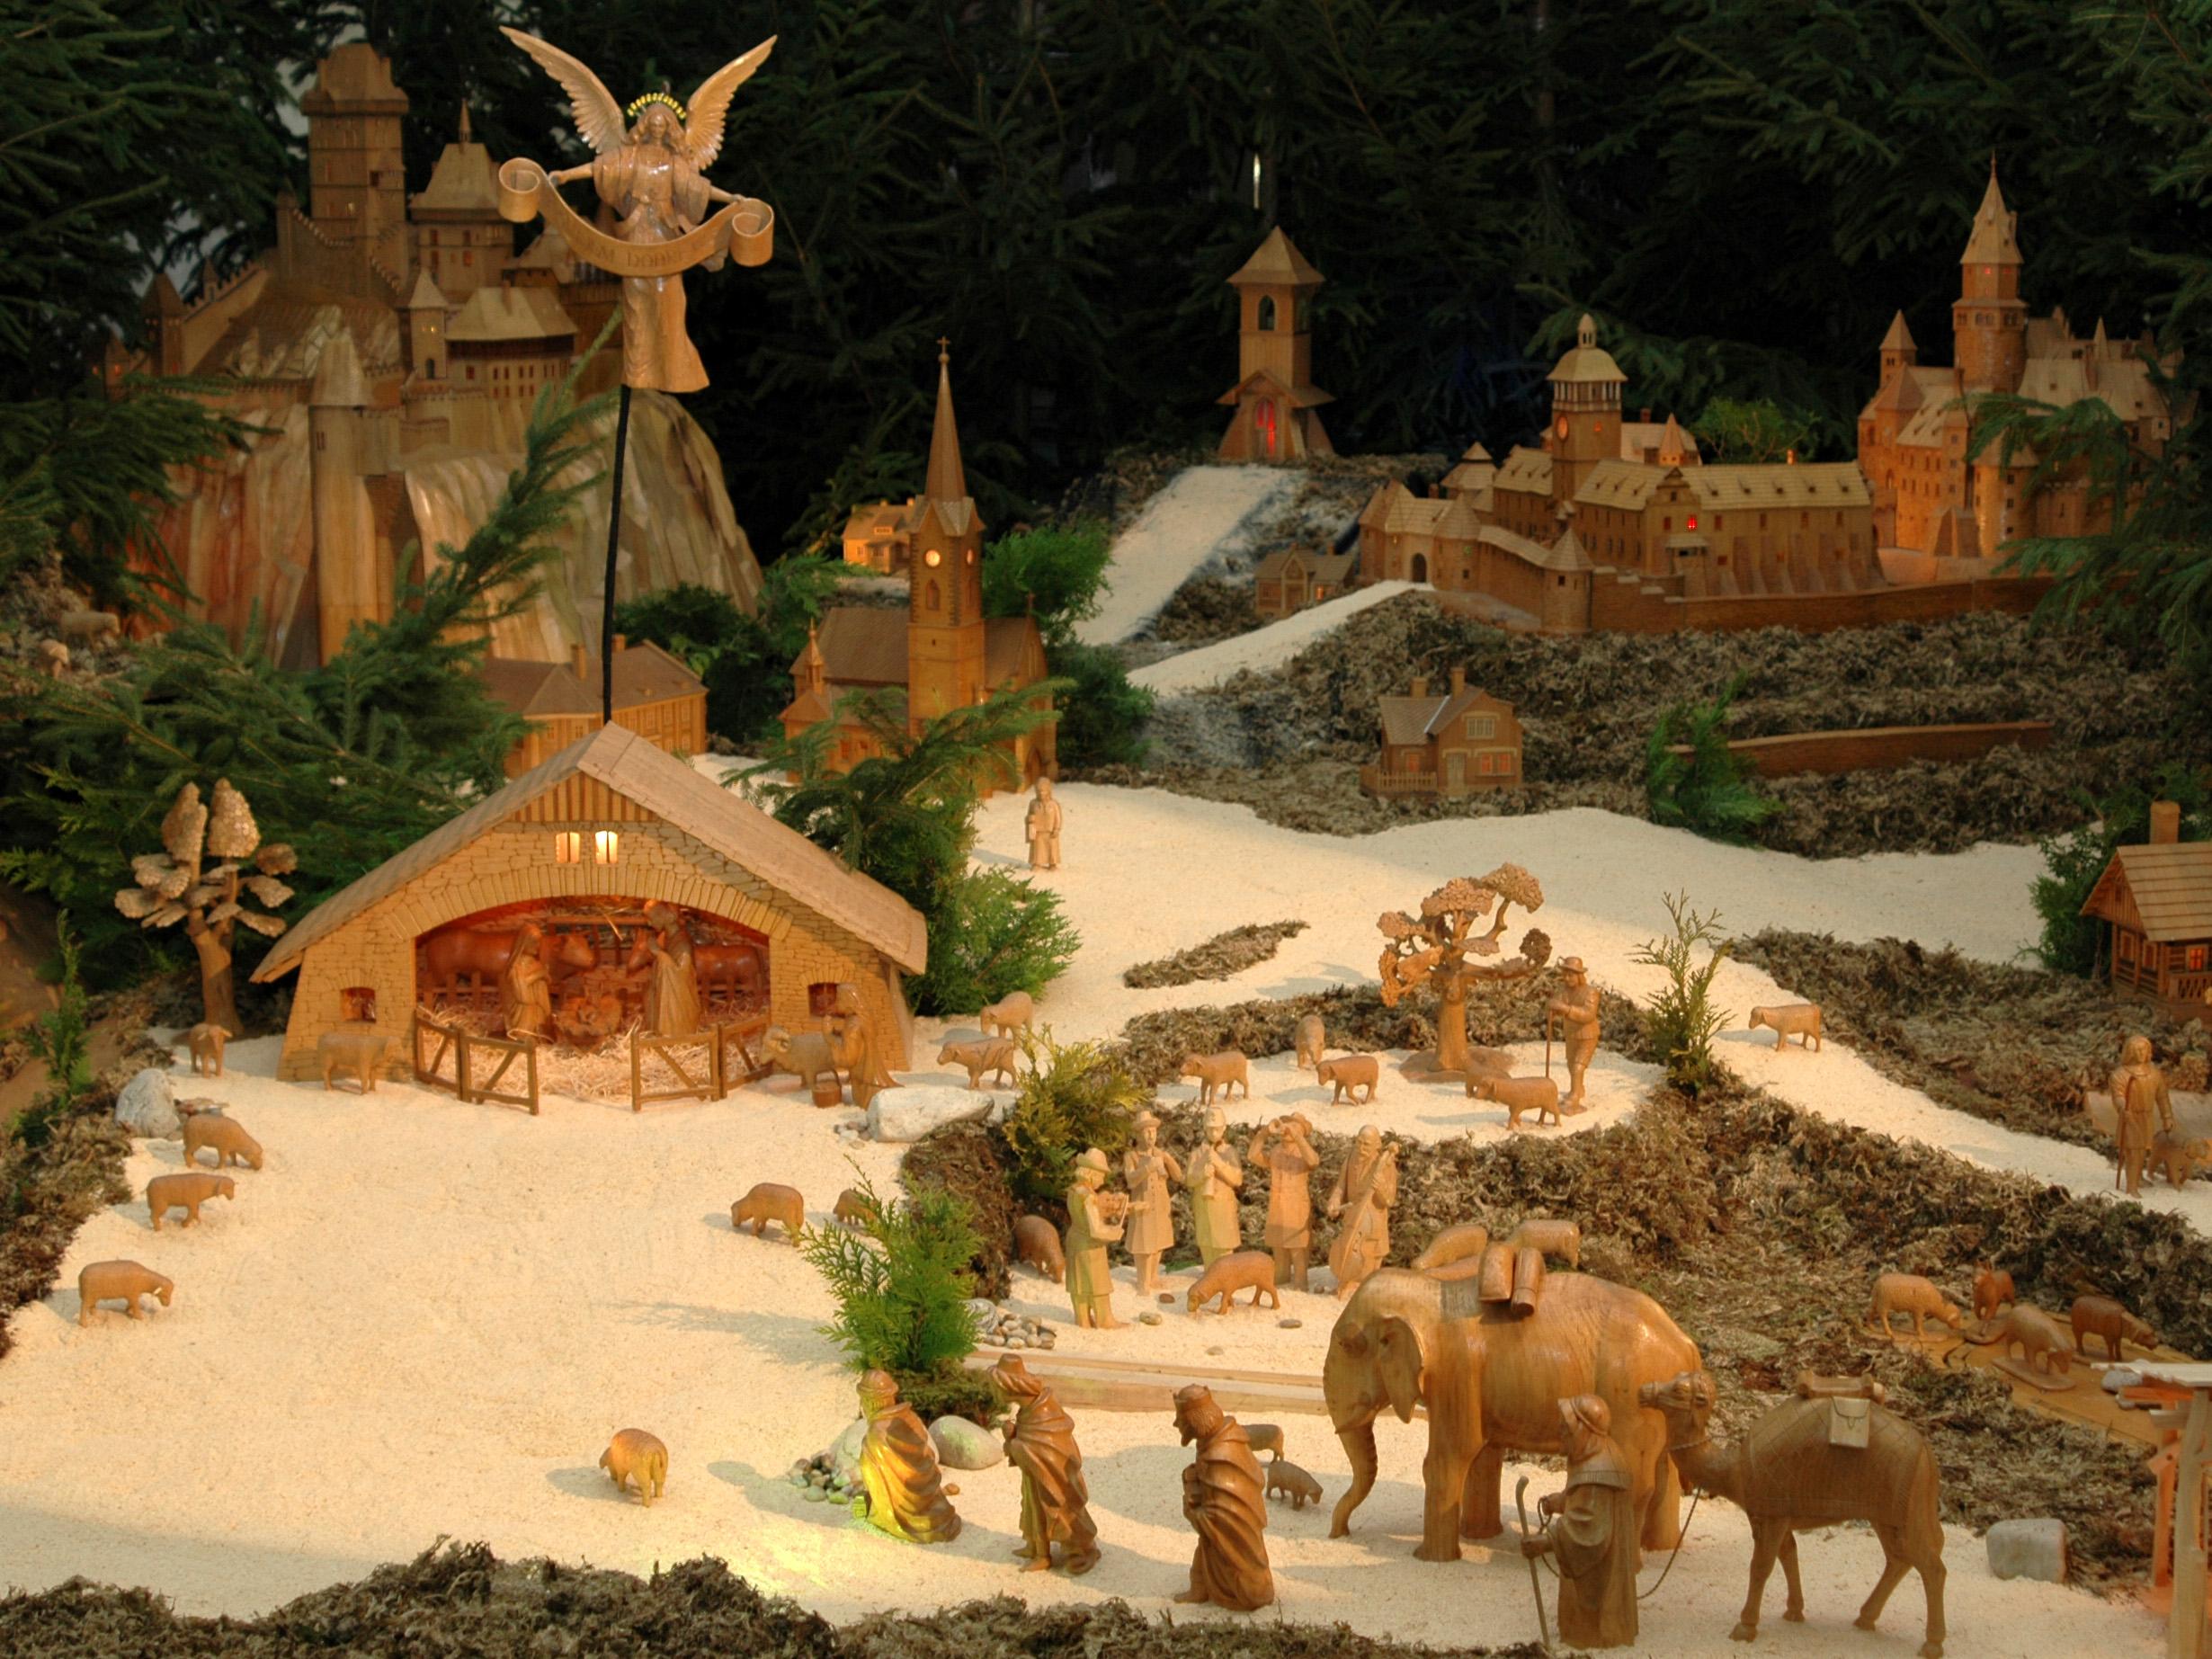 File:Mohelnice nativity scene.jpg - Wikipedia, the free encyclopedia